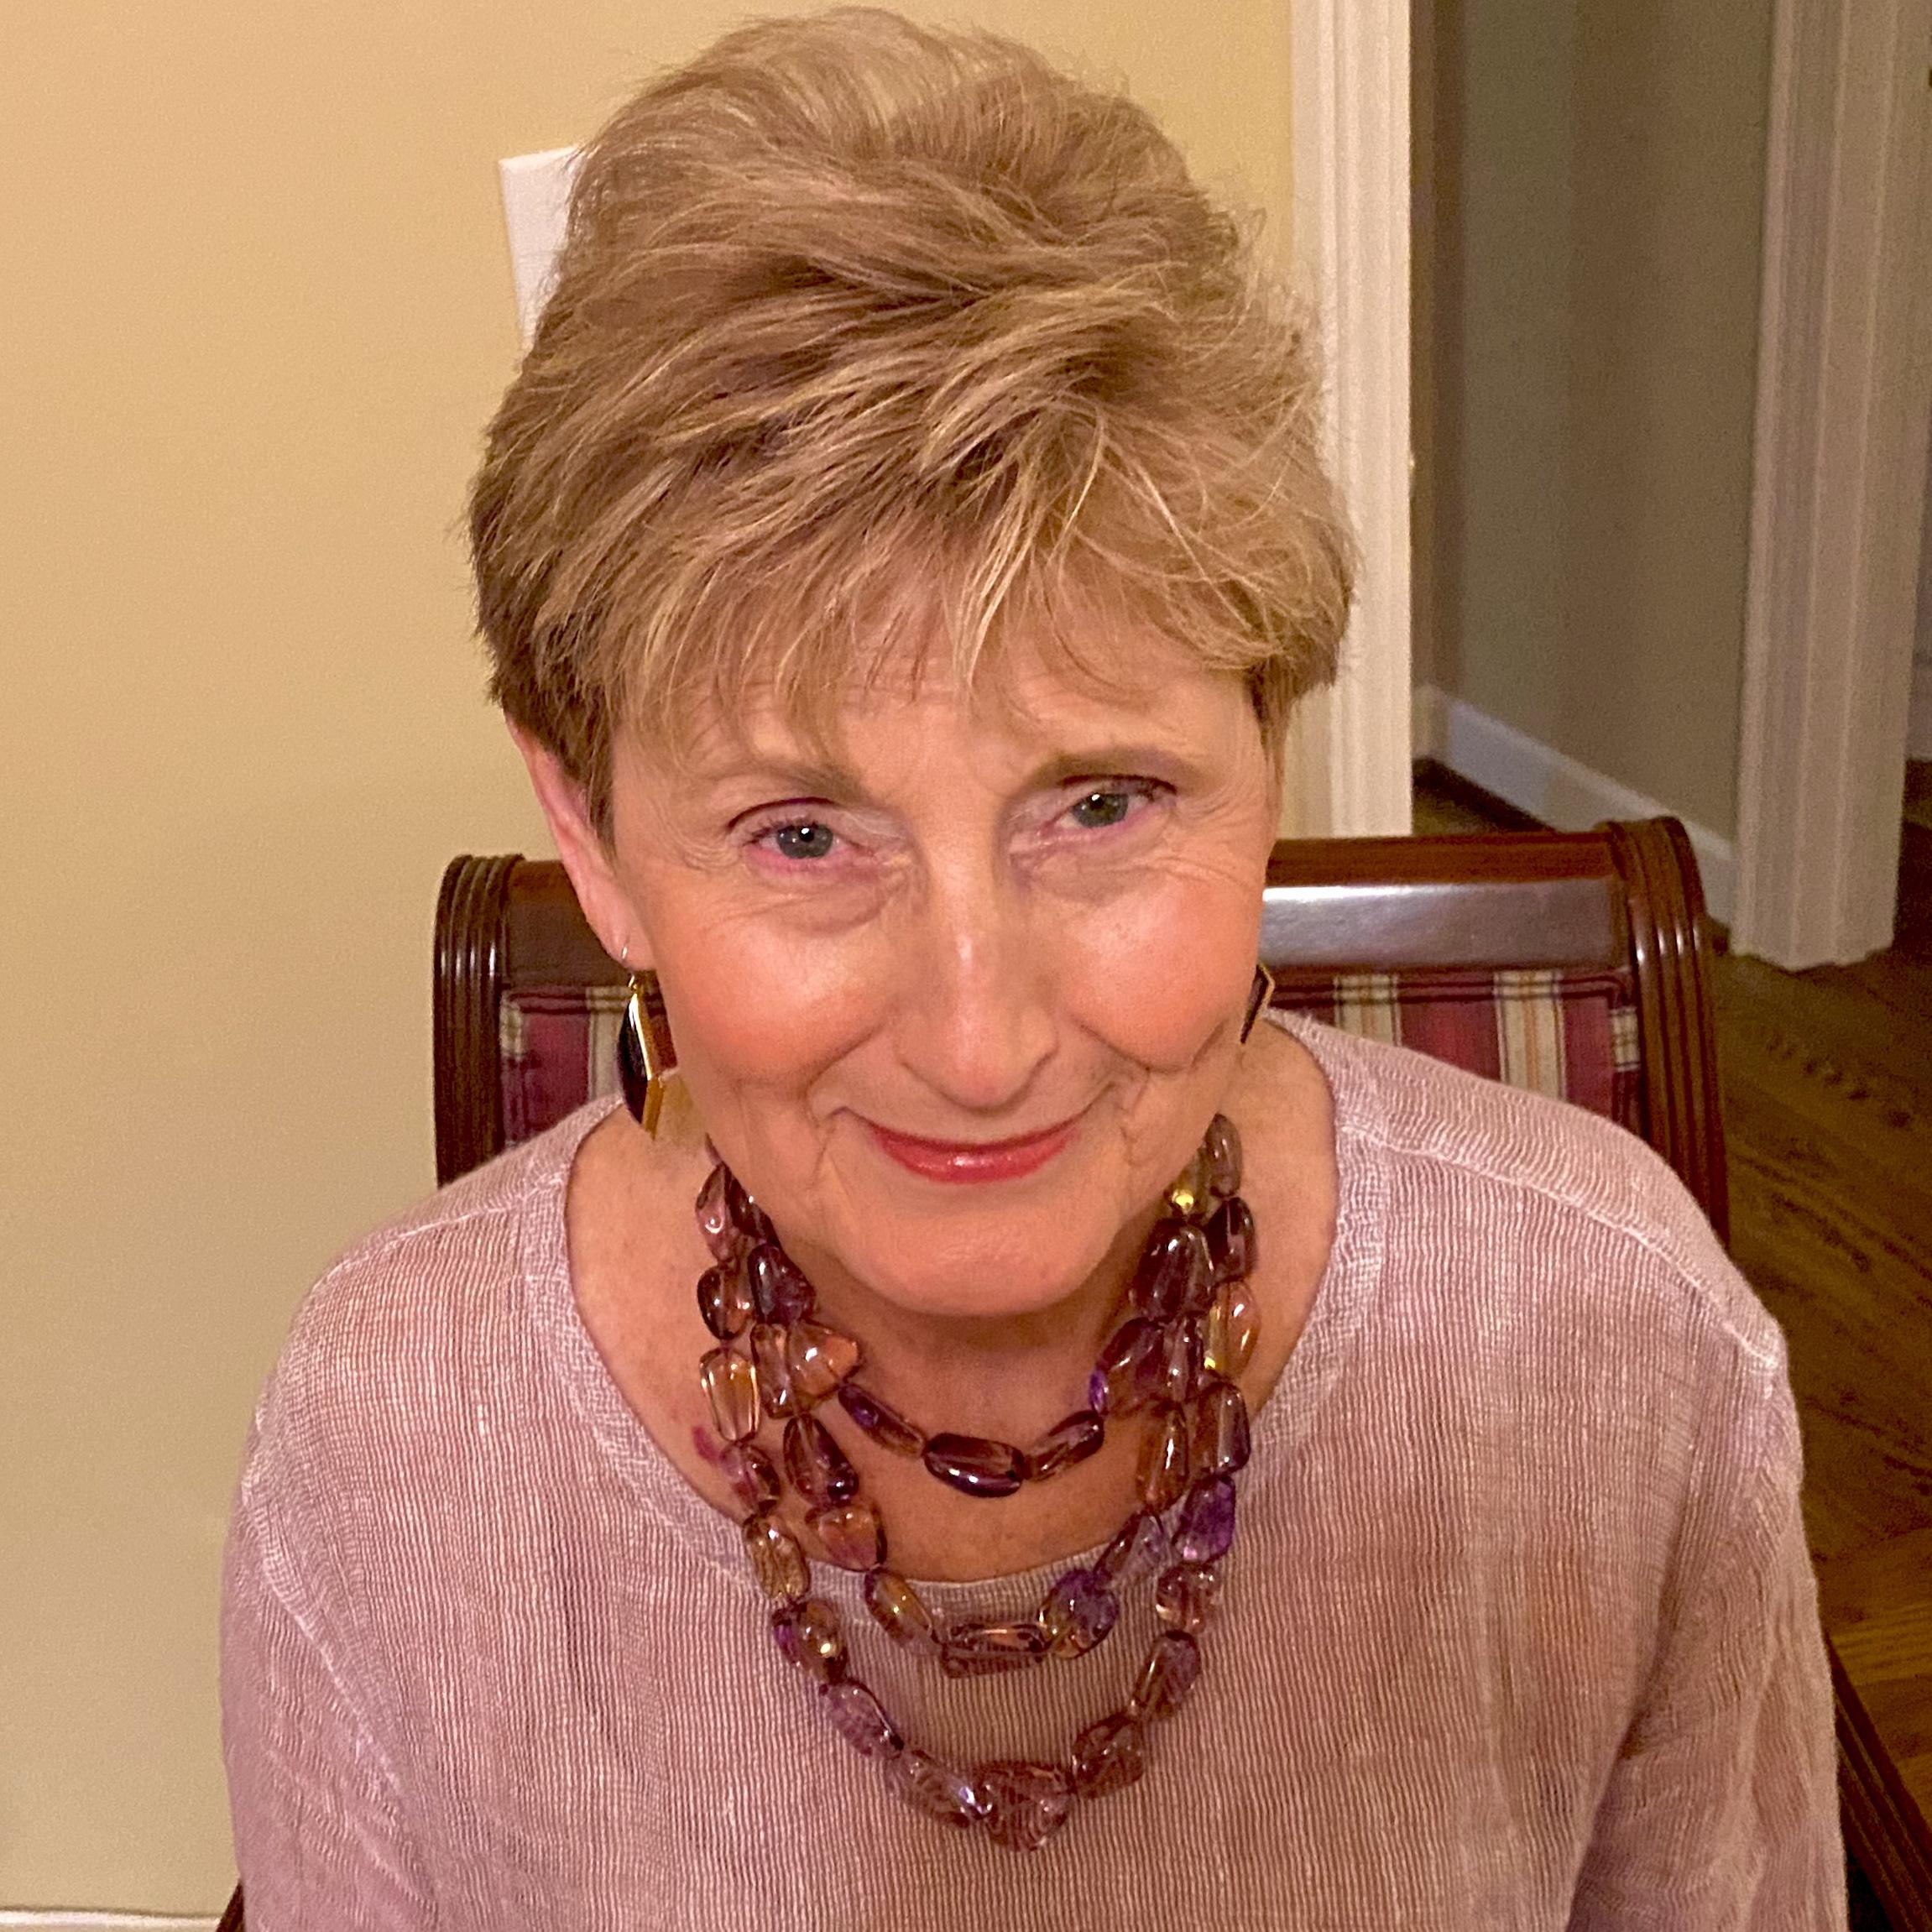 Carolyn's Ametrine beads